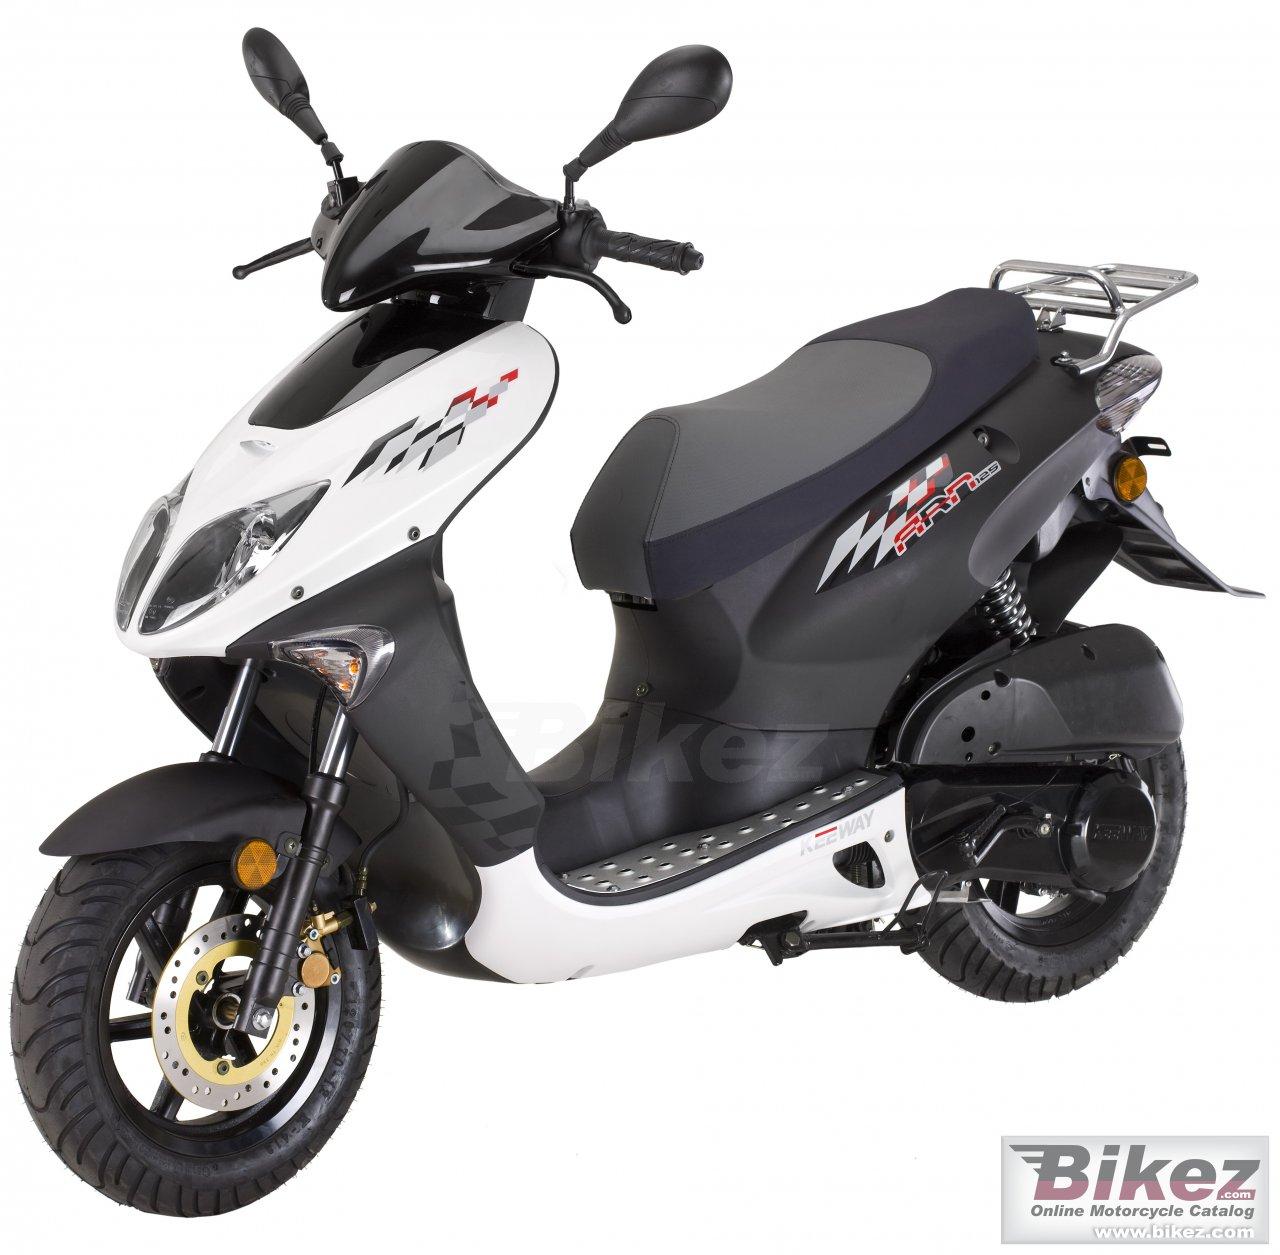 Аренда скутера в аликанте цены